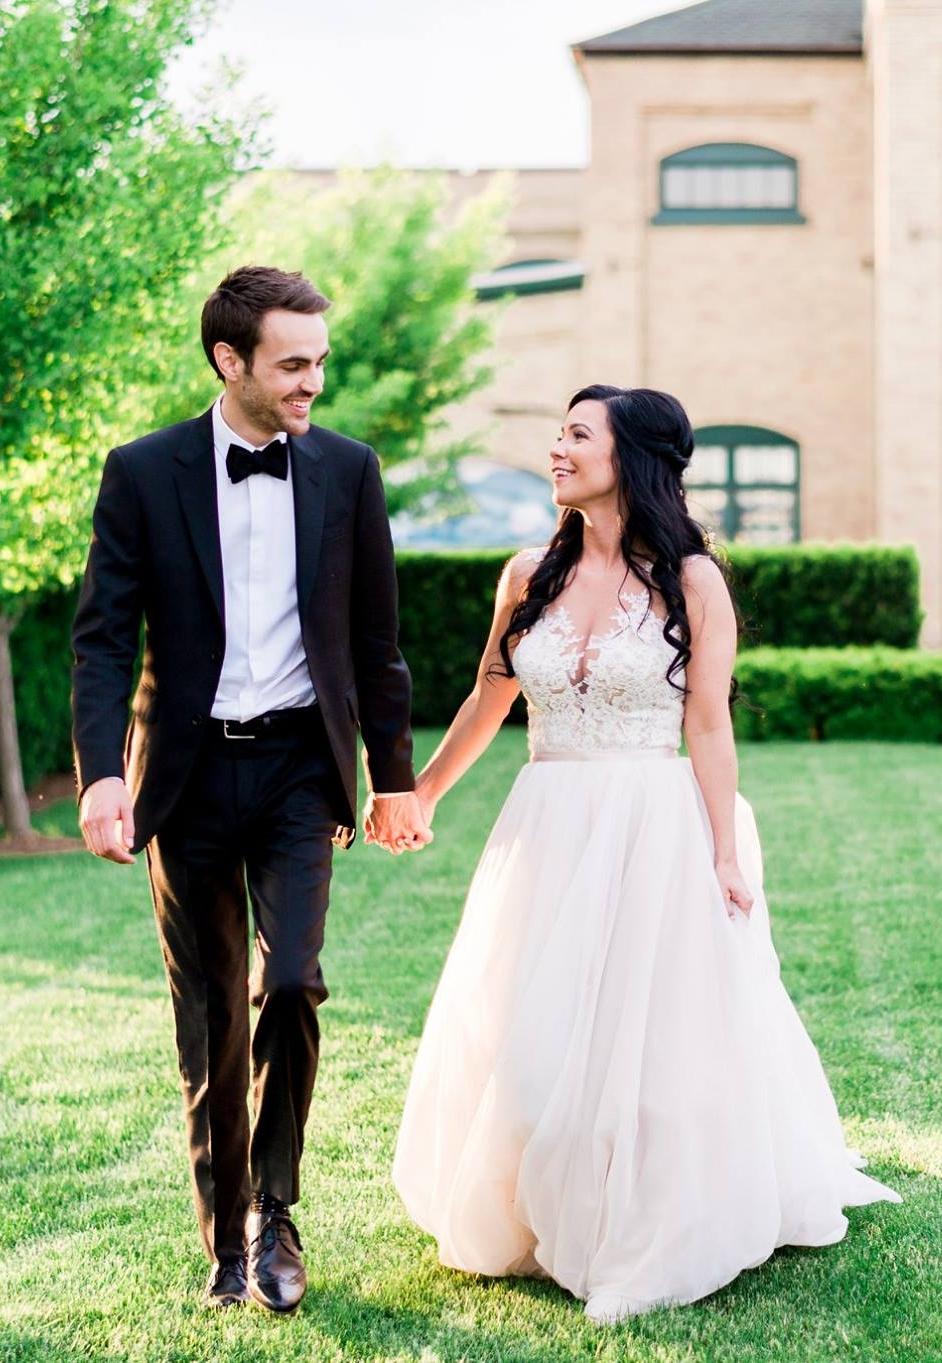 #ferrebride Jacqueline wearing Allure Bridals